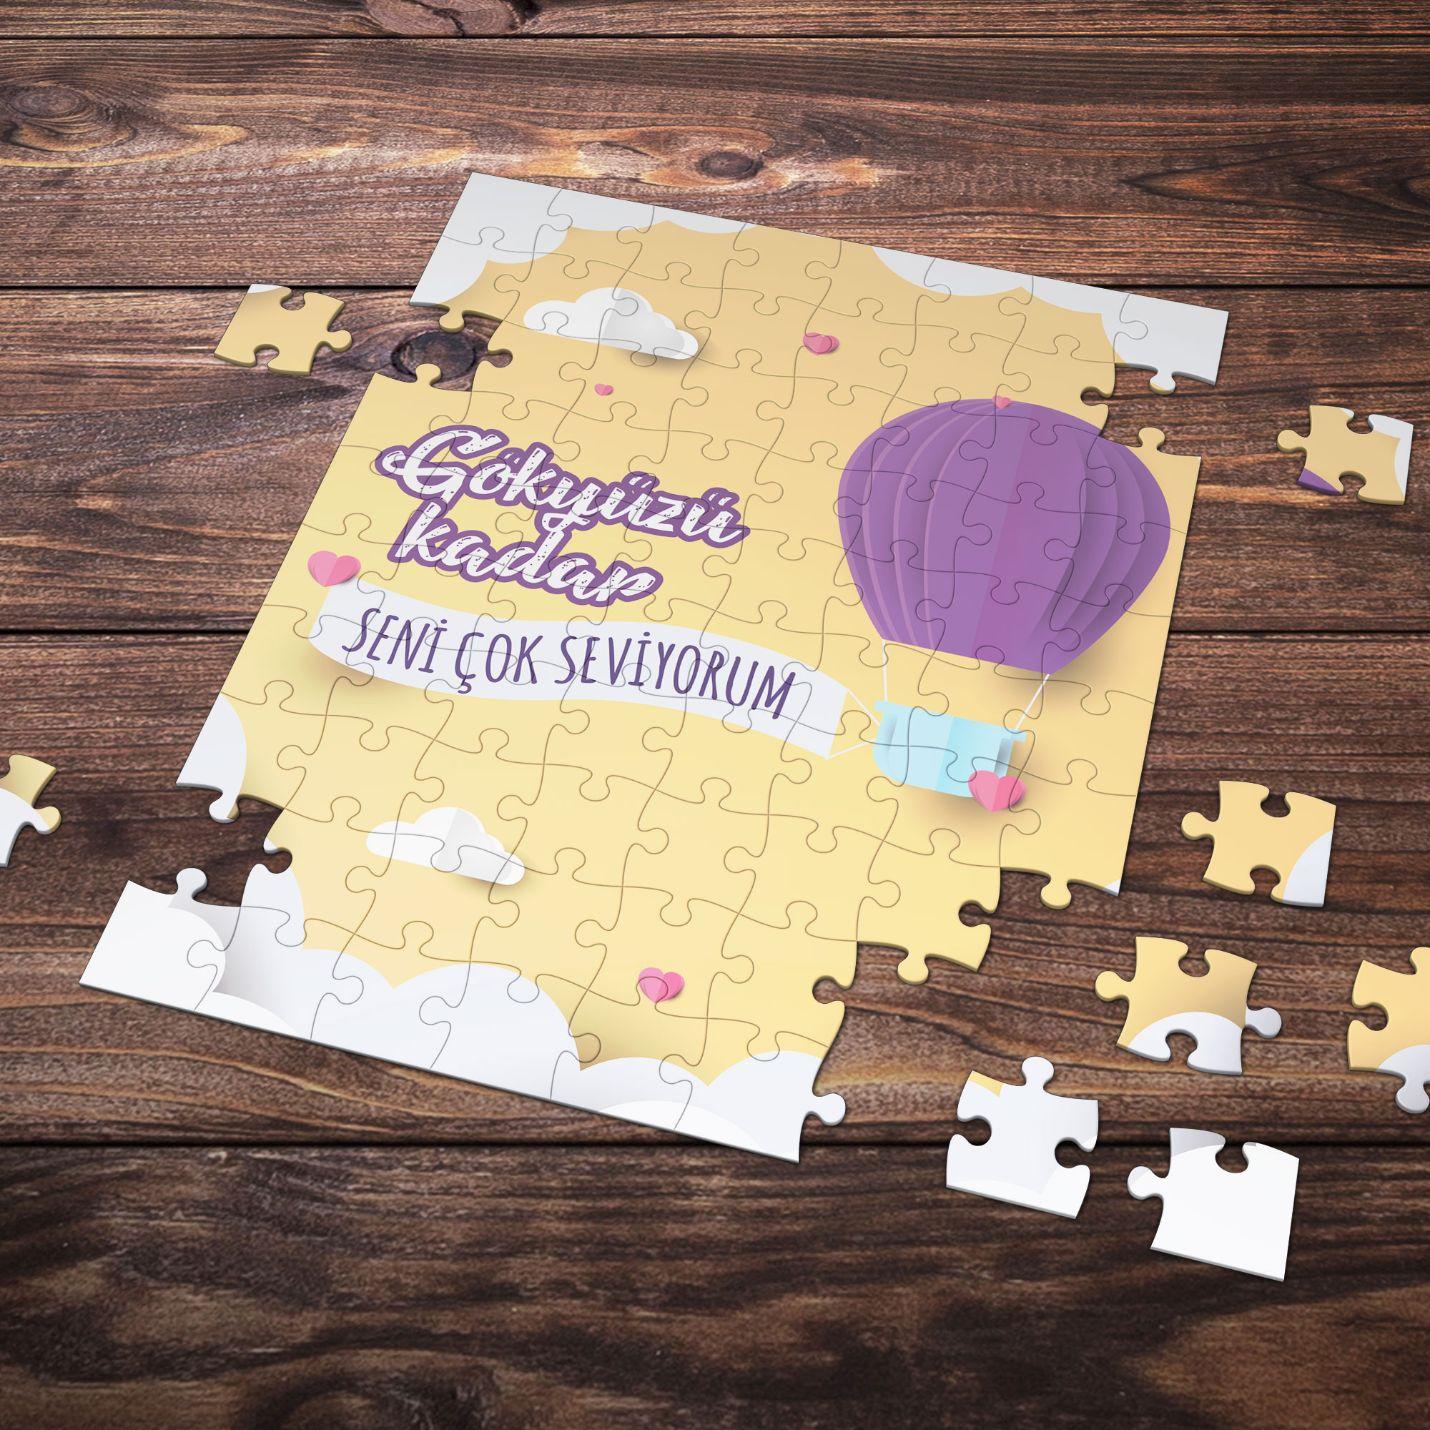 99 Parça Romantik Tasarımlı Puzzle Yapboz No19